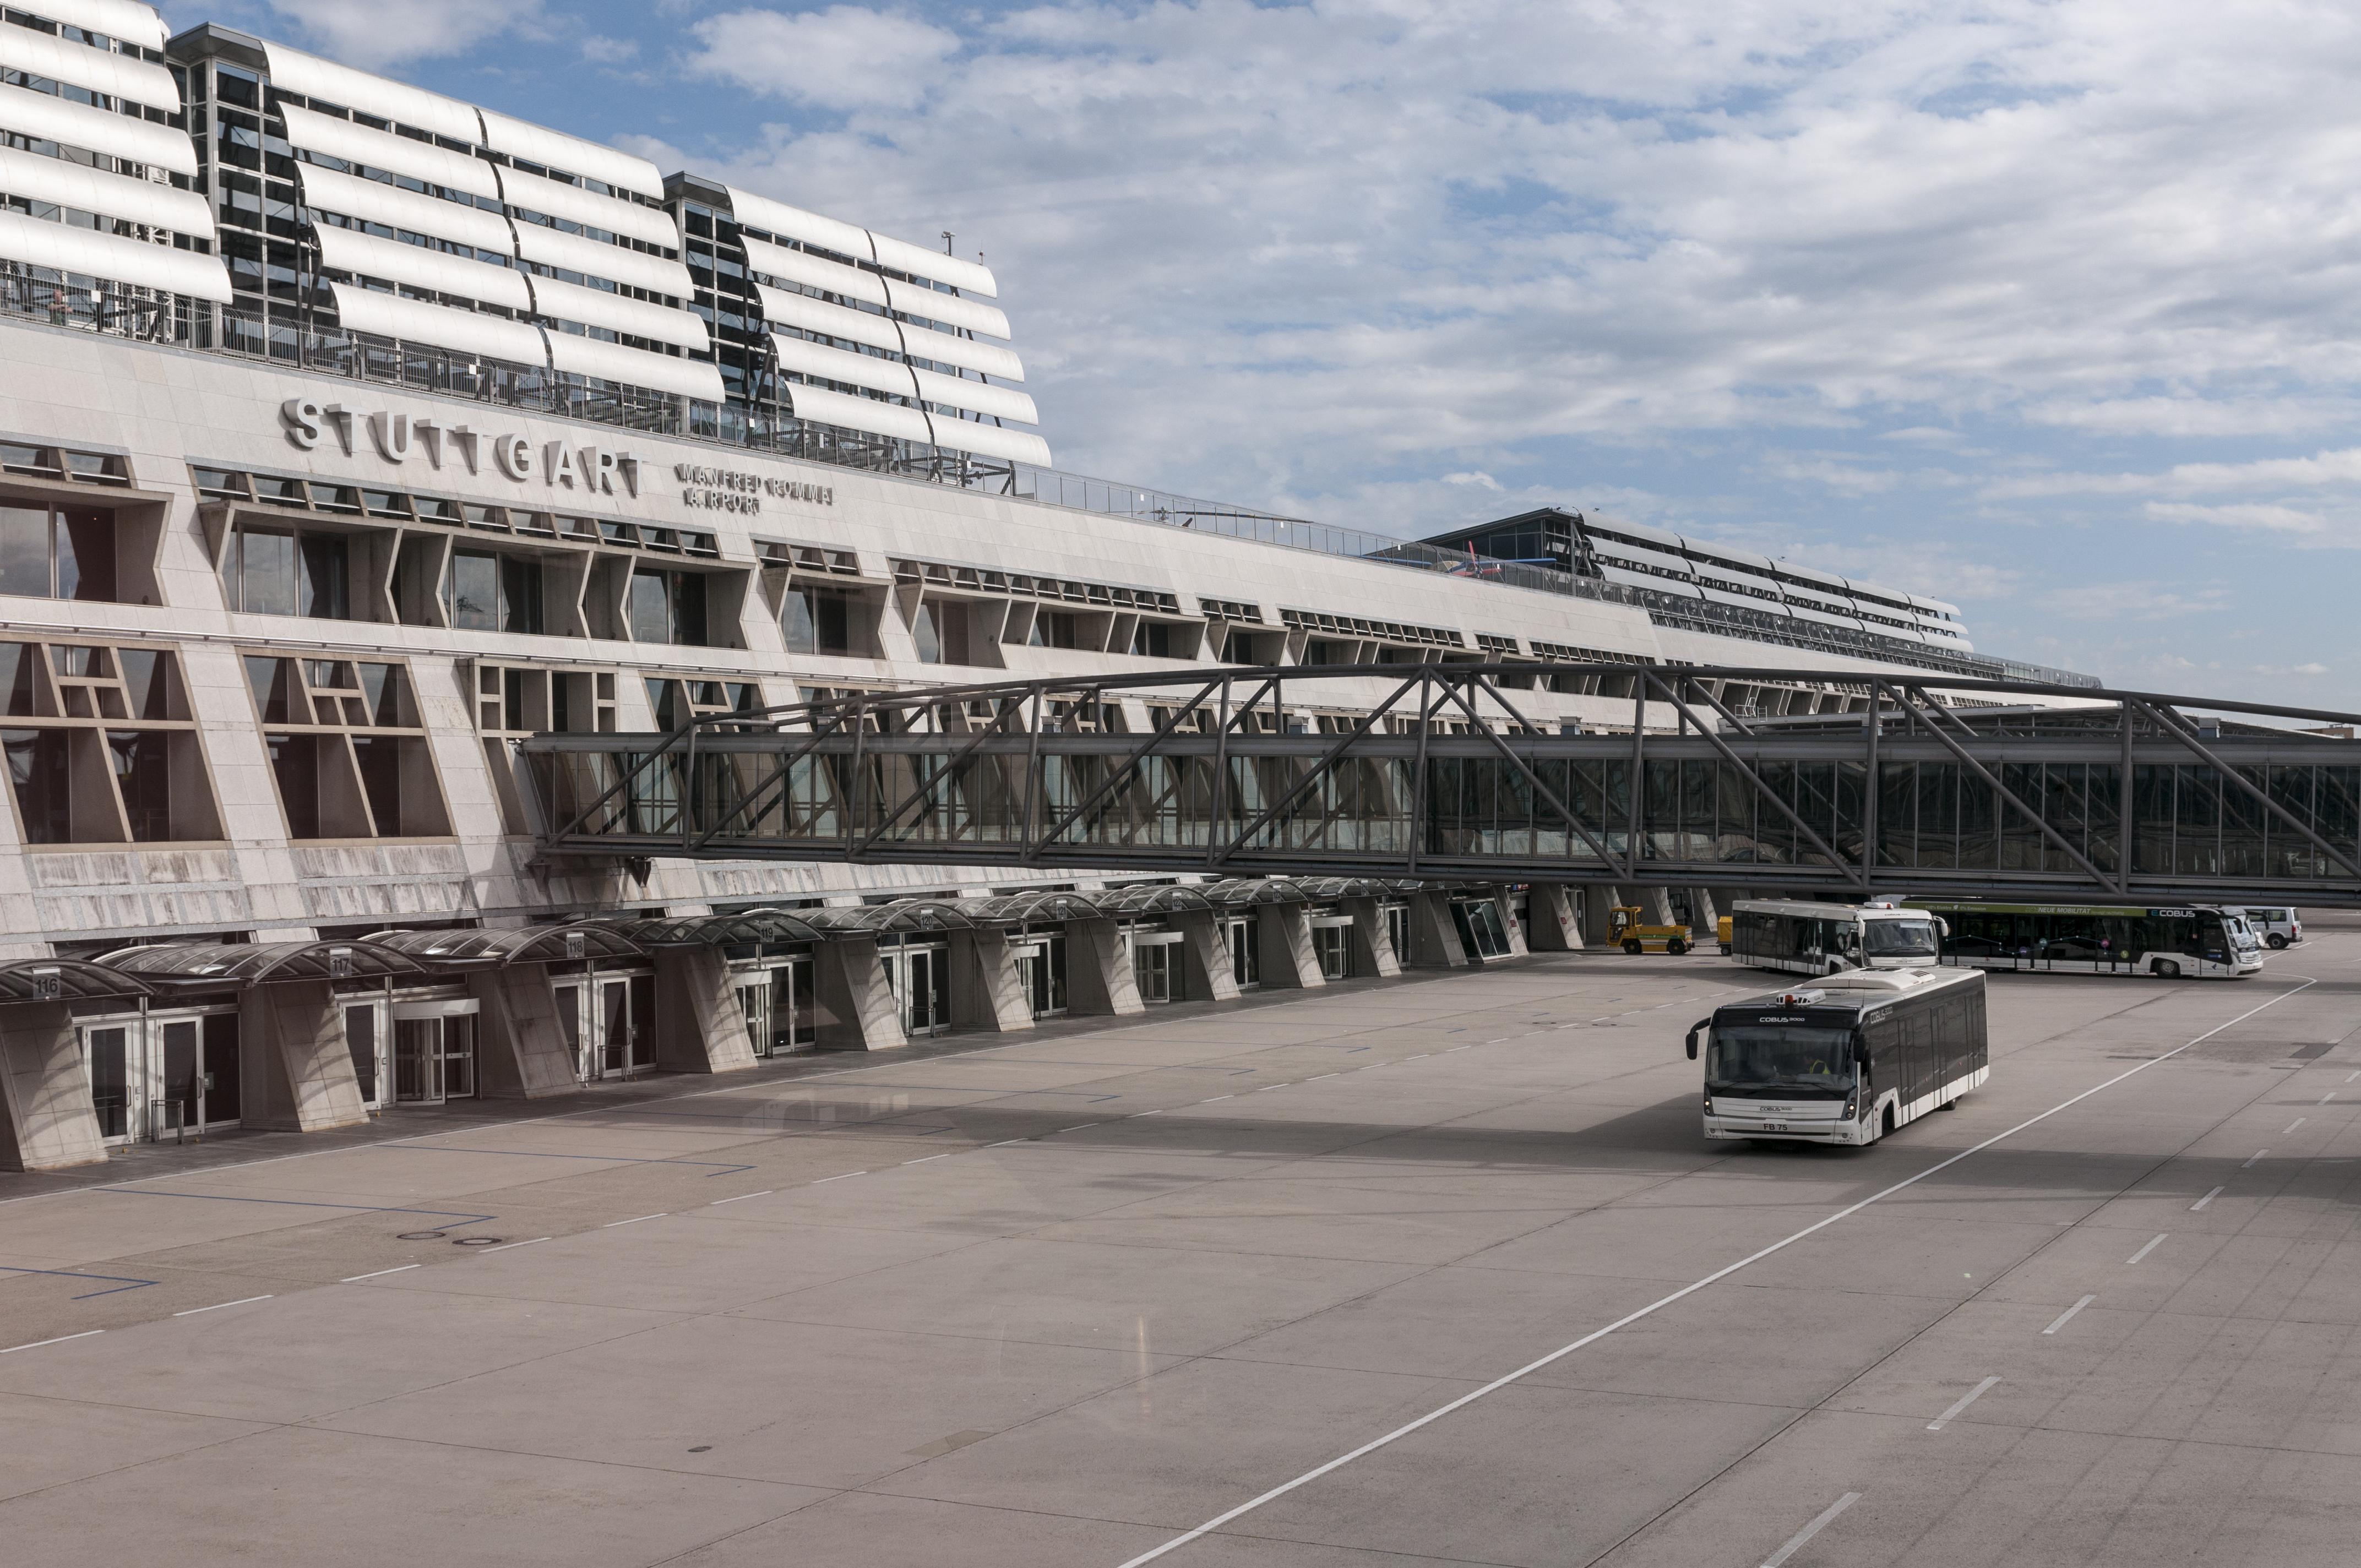 Stuttgart Lufthavn Wikipedia